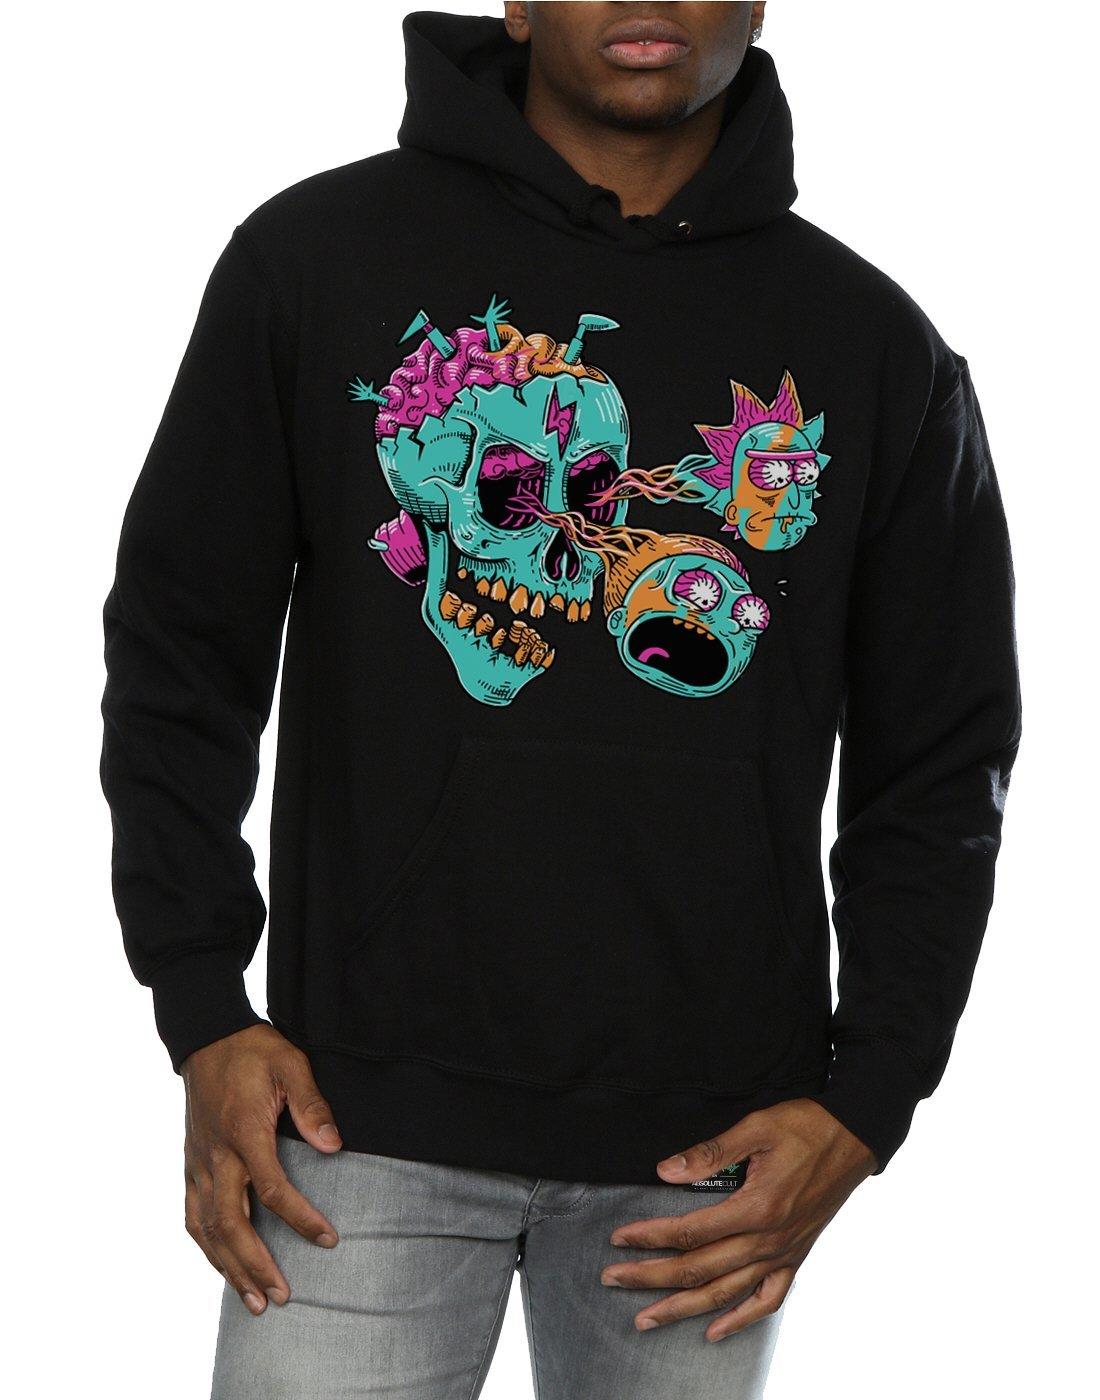 Rick and Morty: Eyeball Skull Hoodie (XX-Large) image